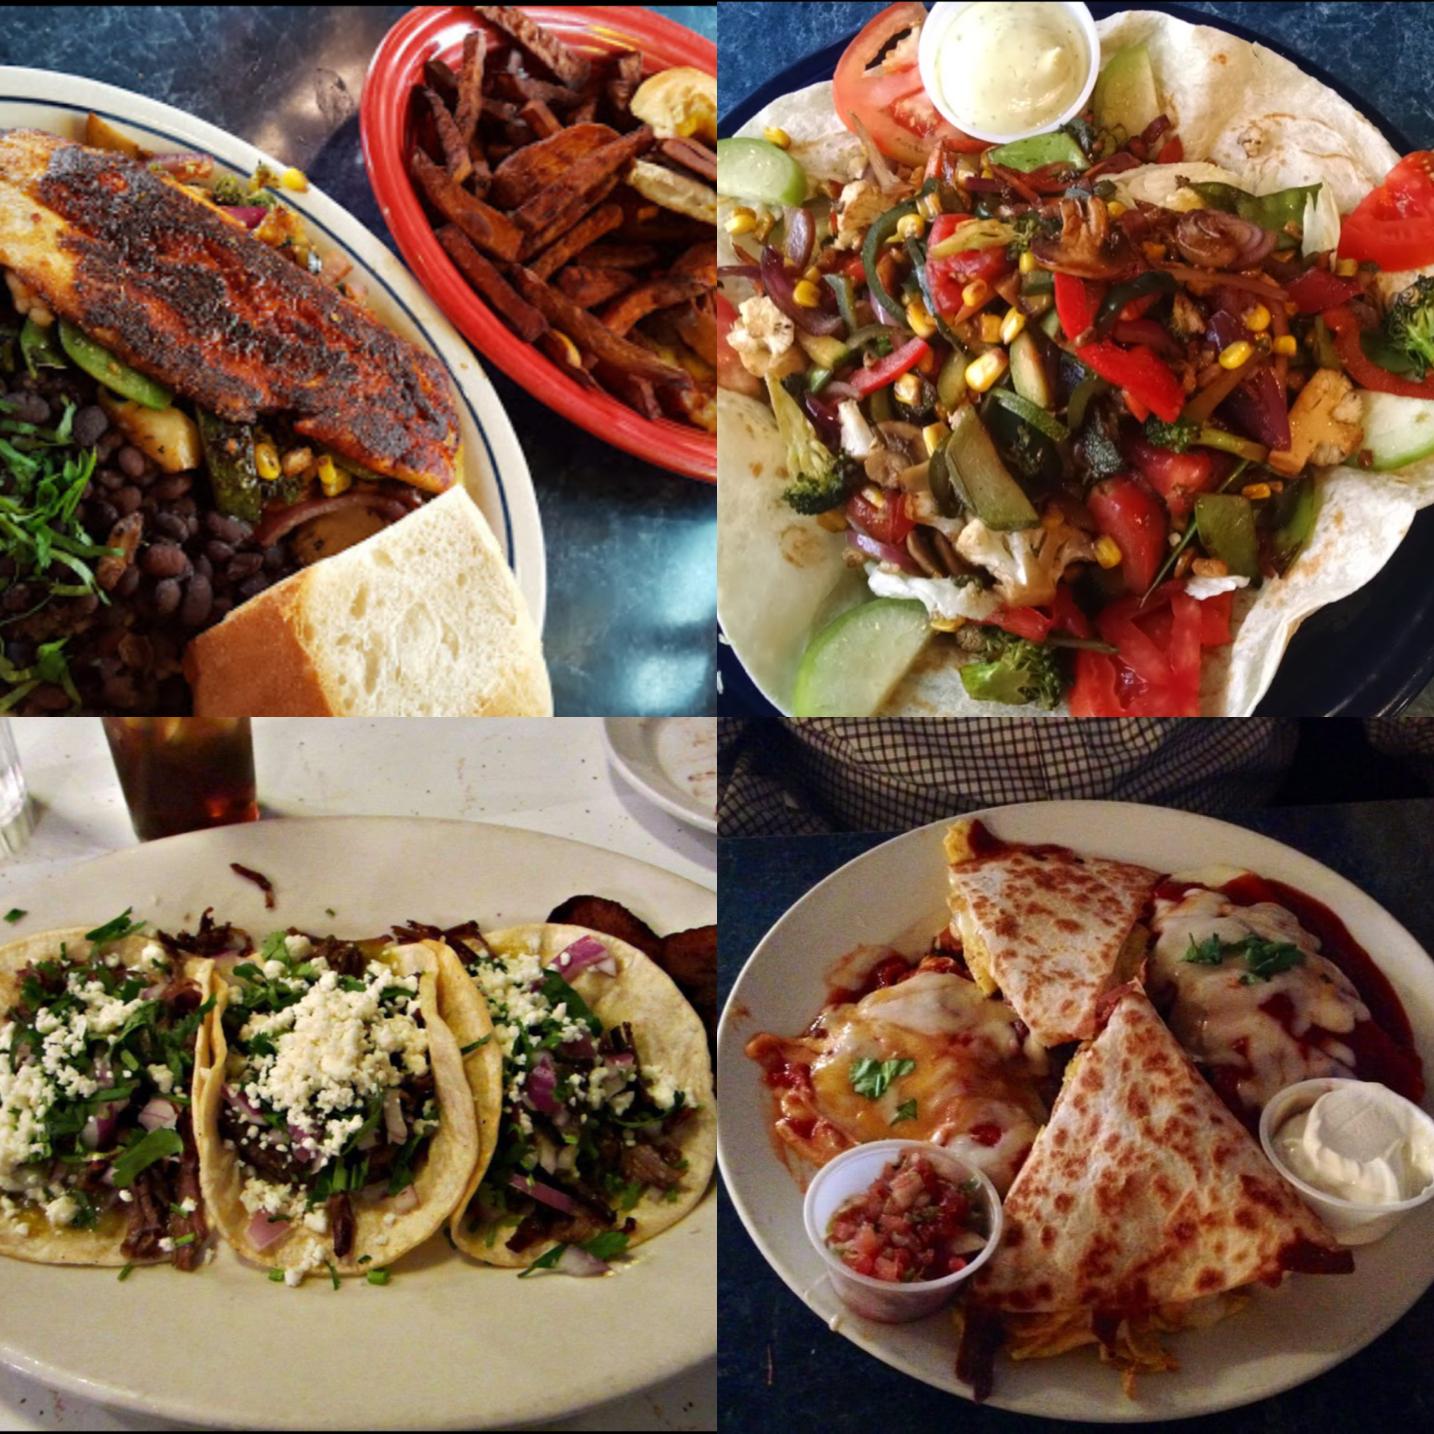 Photo Credit: Starliner Diner Yelp Reviews